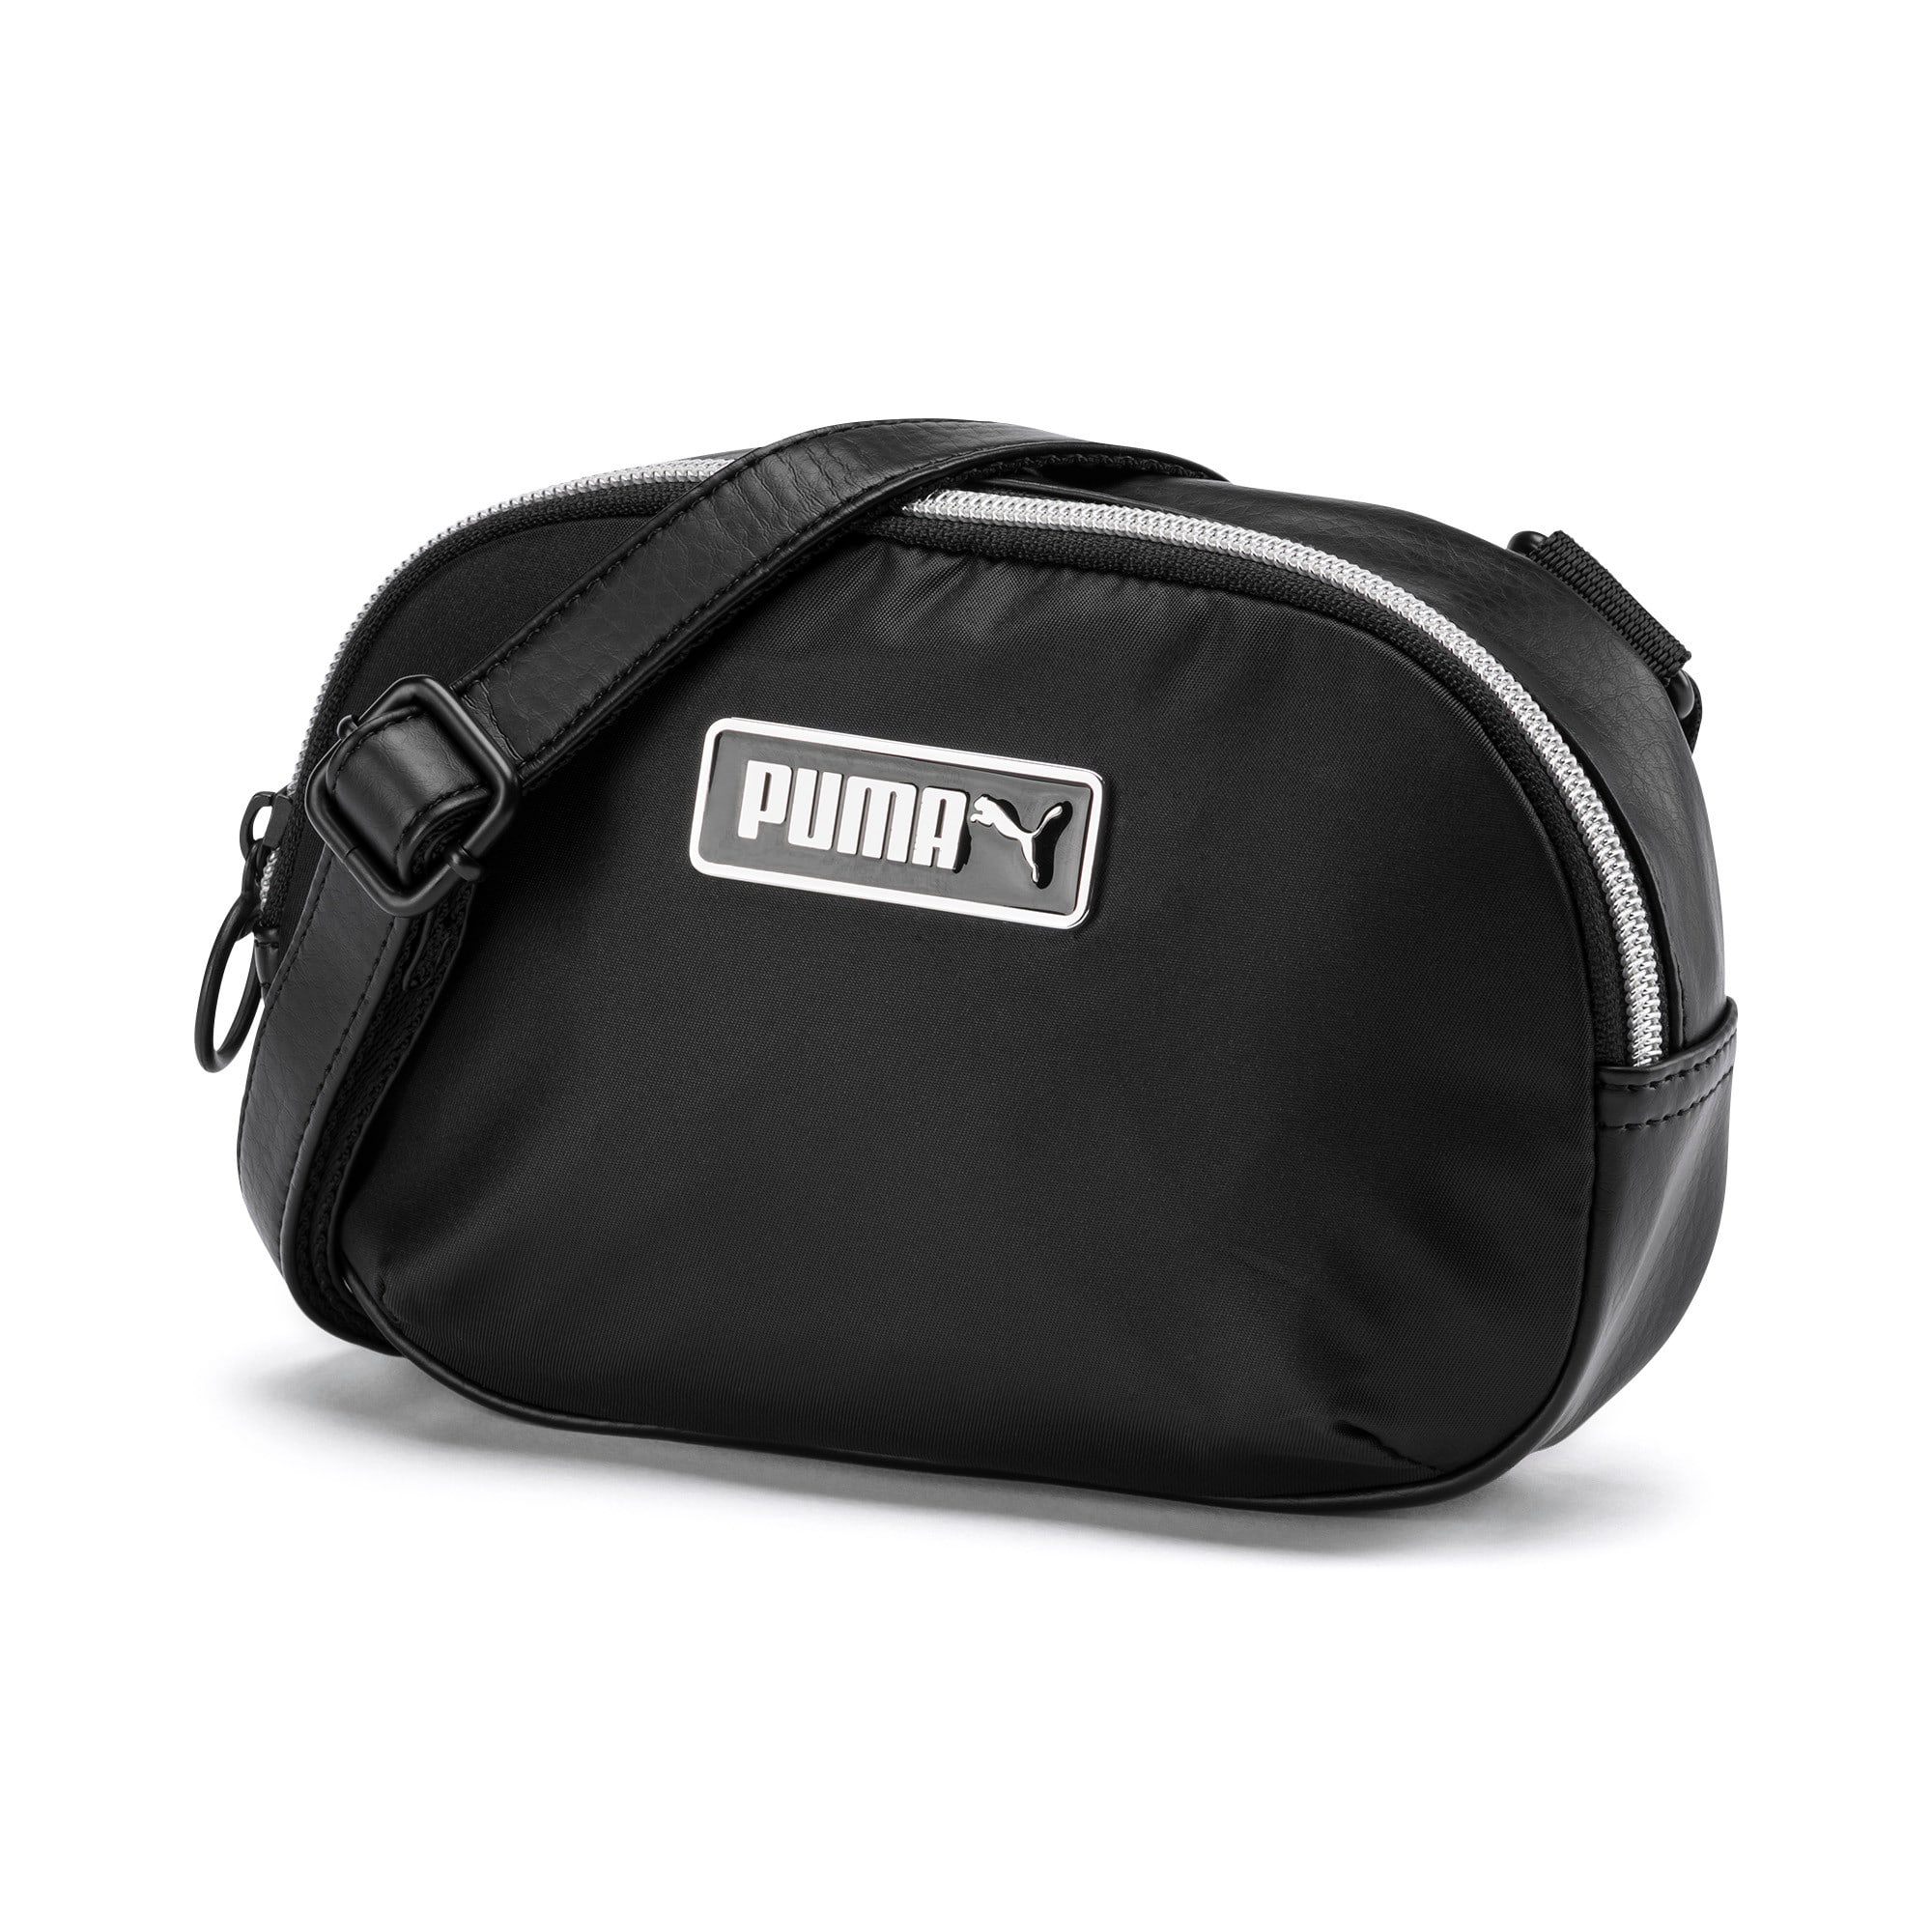 Thumbnail 1 of Classics Women's X-Body Bag, Puma Black, medium-IND